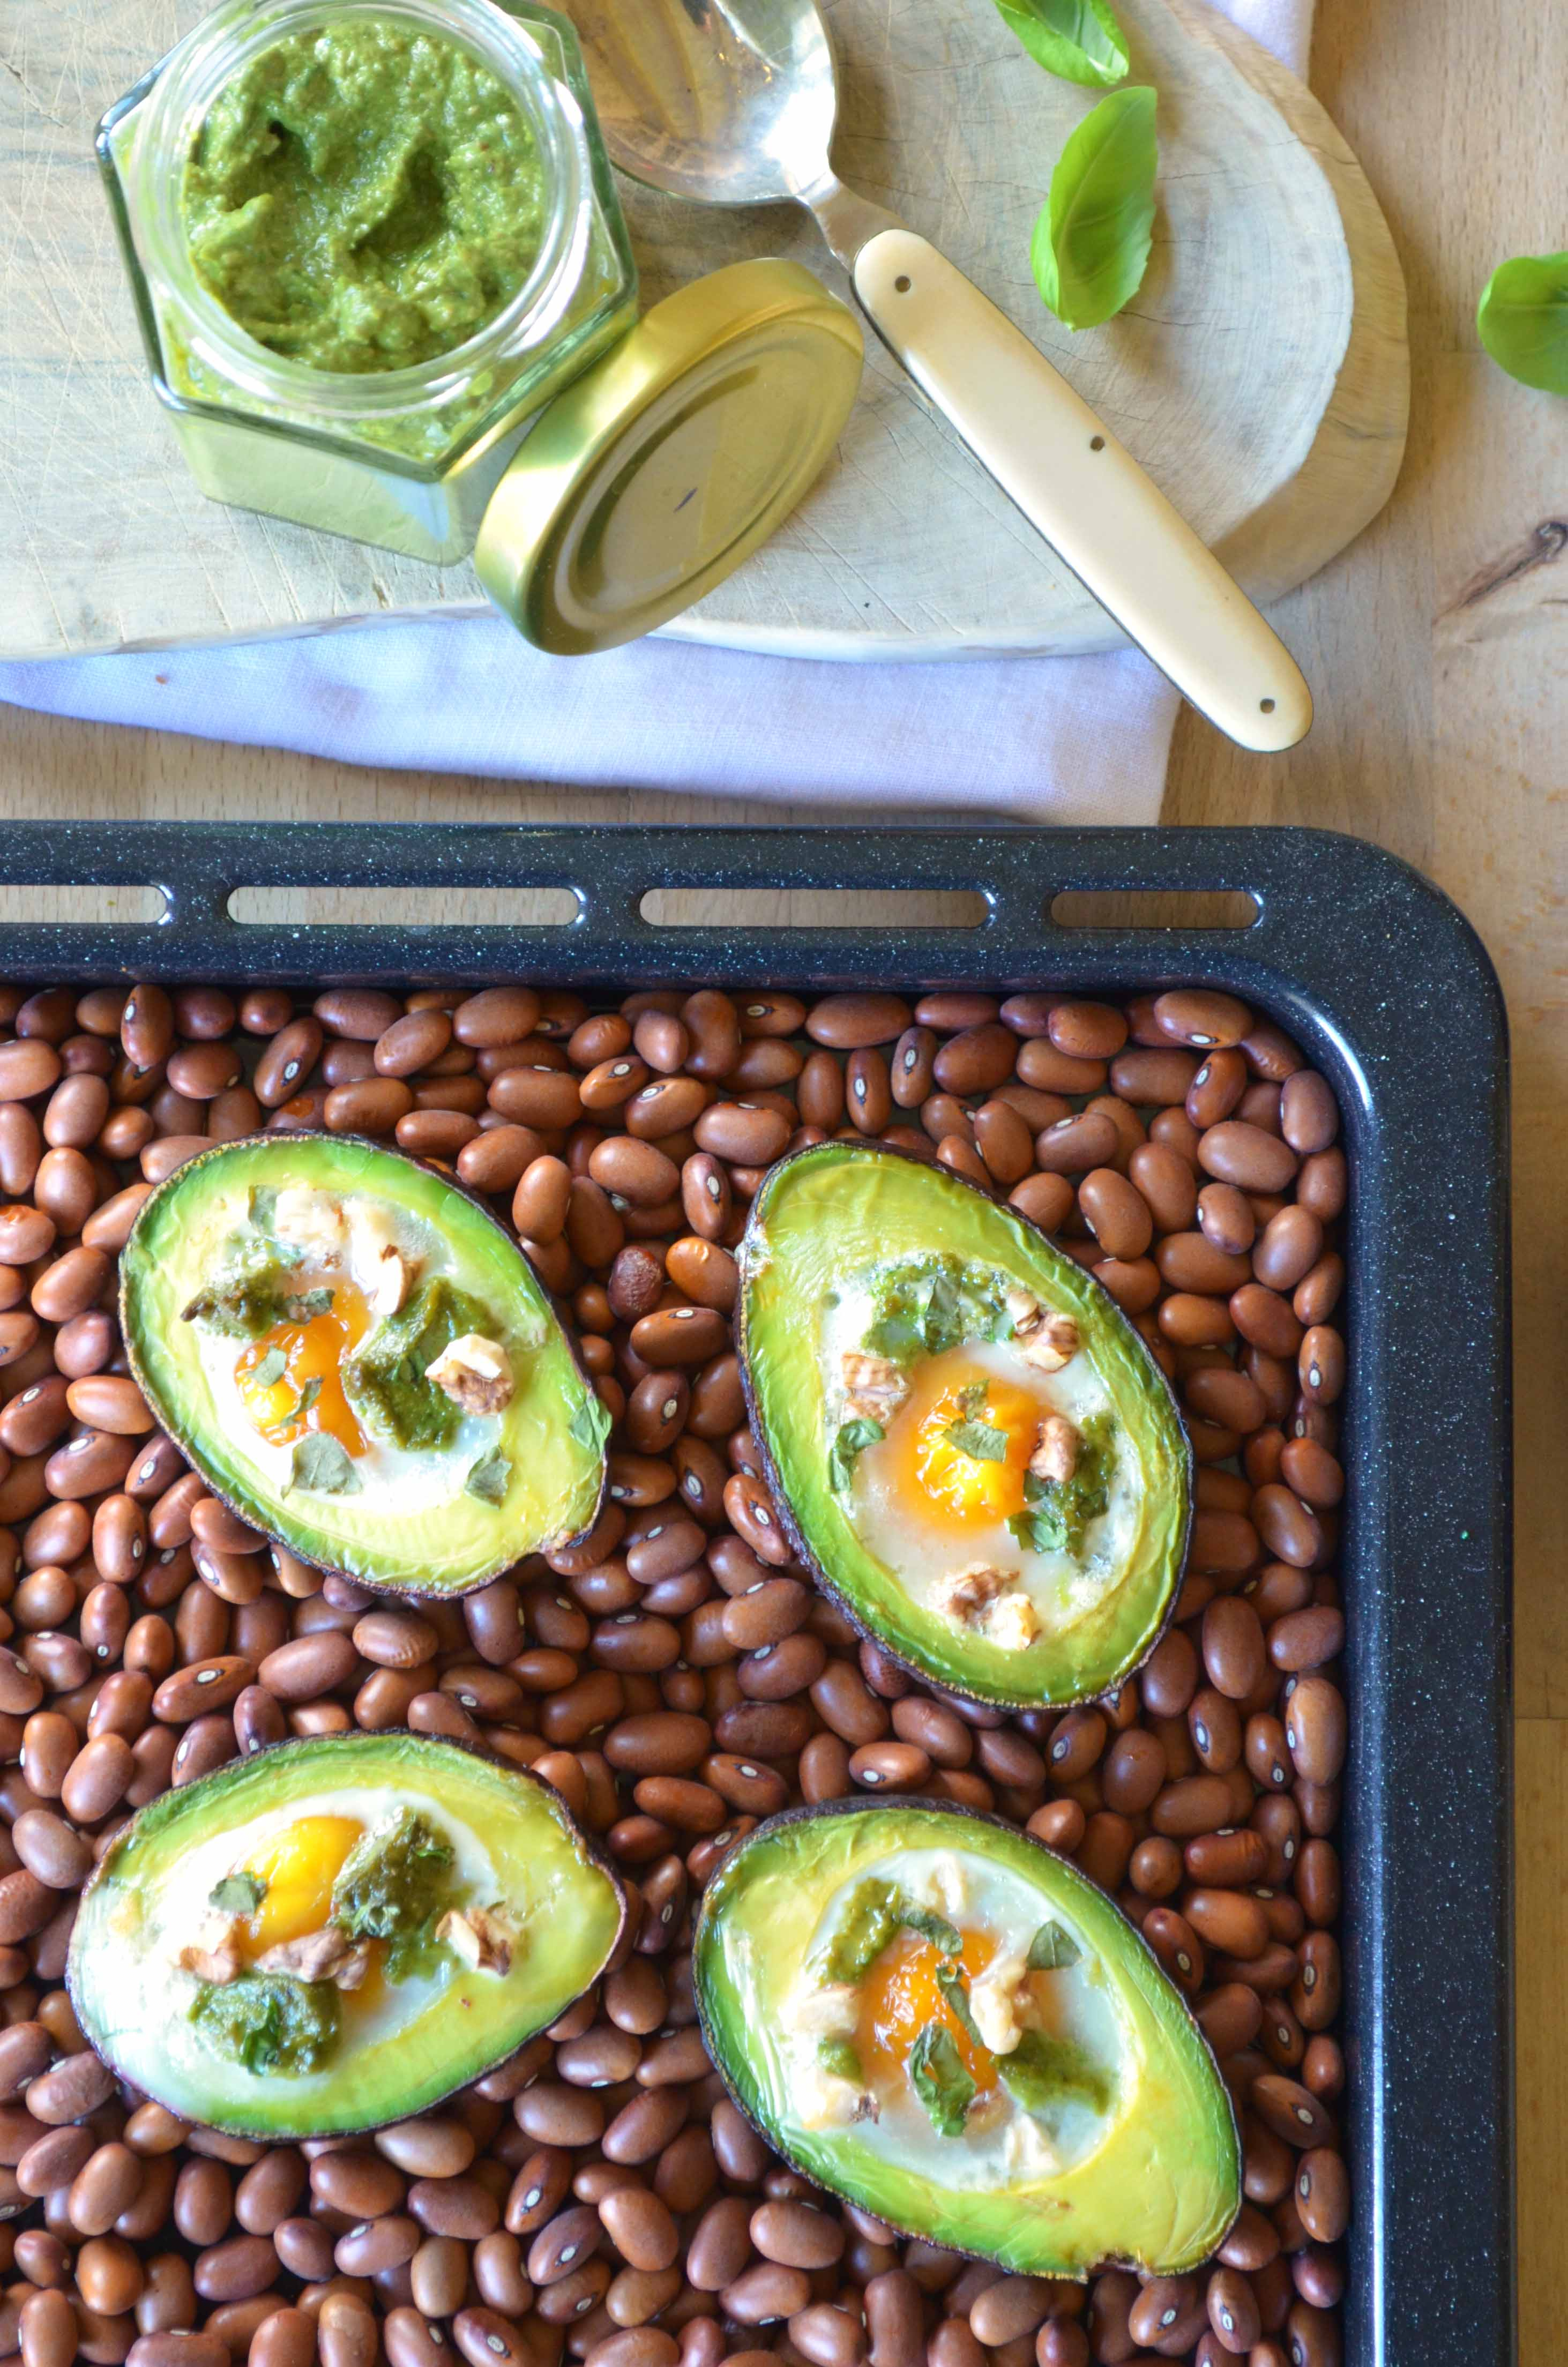 Avocado Boats with Eggs and Creamy Pesto